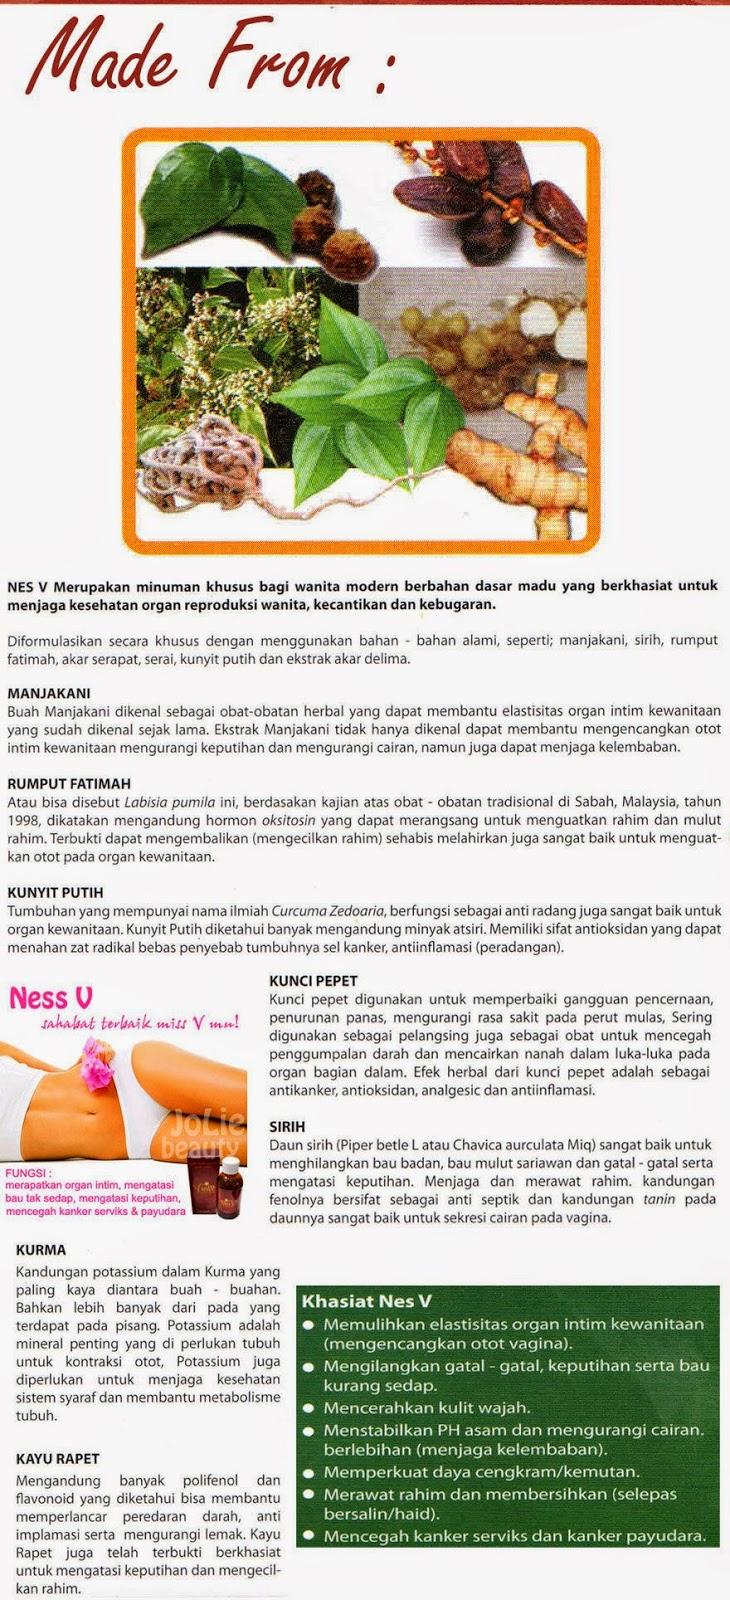 Sedia Produk Herbal Hwi Info Tlp 081212423212 08176619212 Nes V Ramuan Kesehatan Wanita Lanjut Http Agenhwicom Nesvhtml Tlpn Pin Bb310c3161